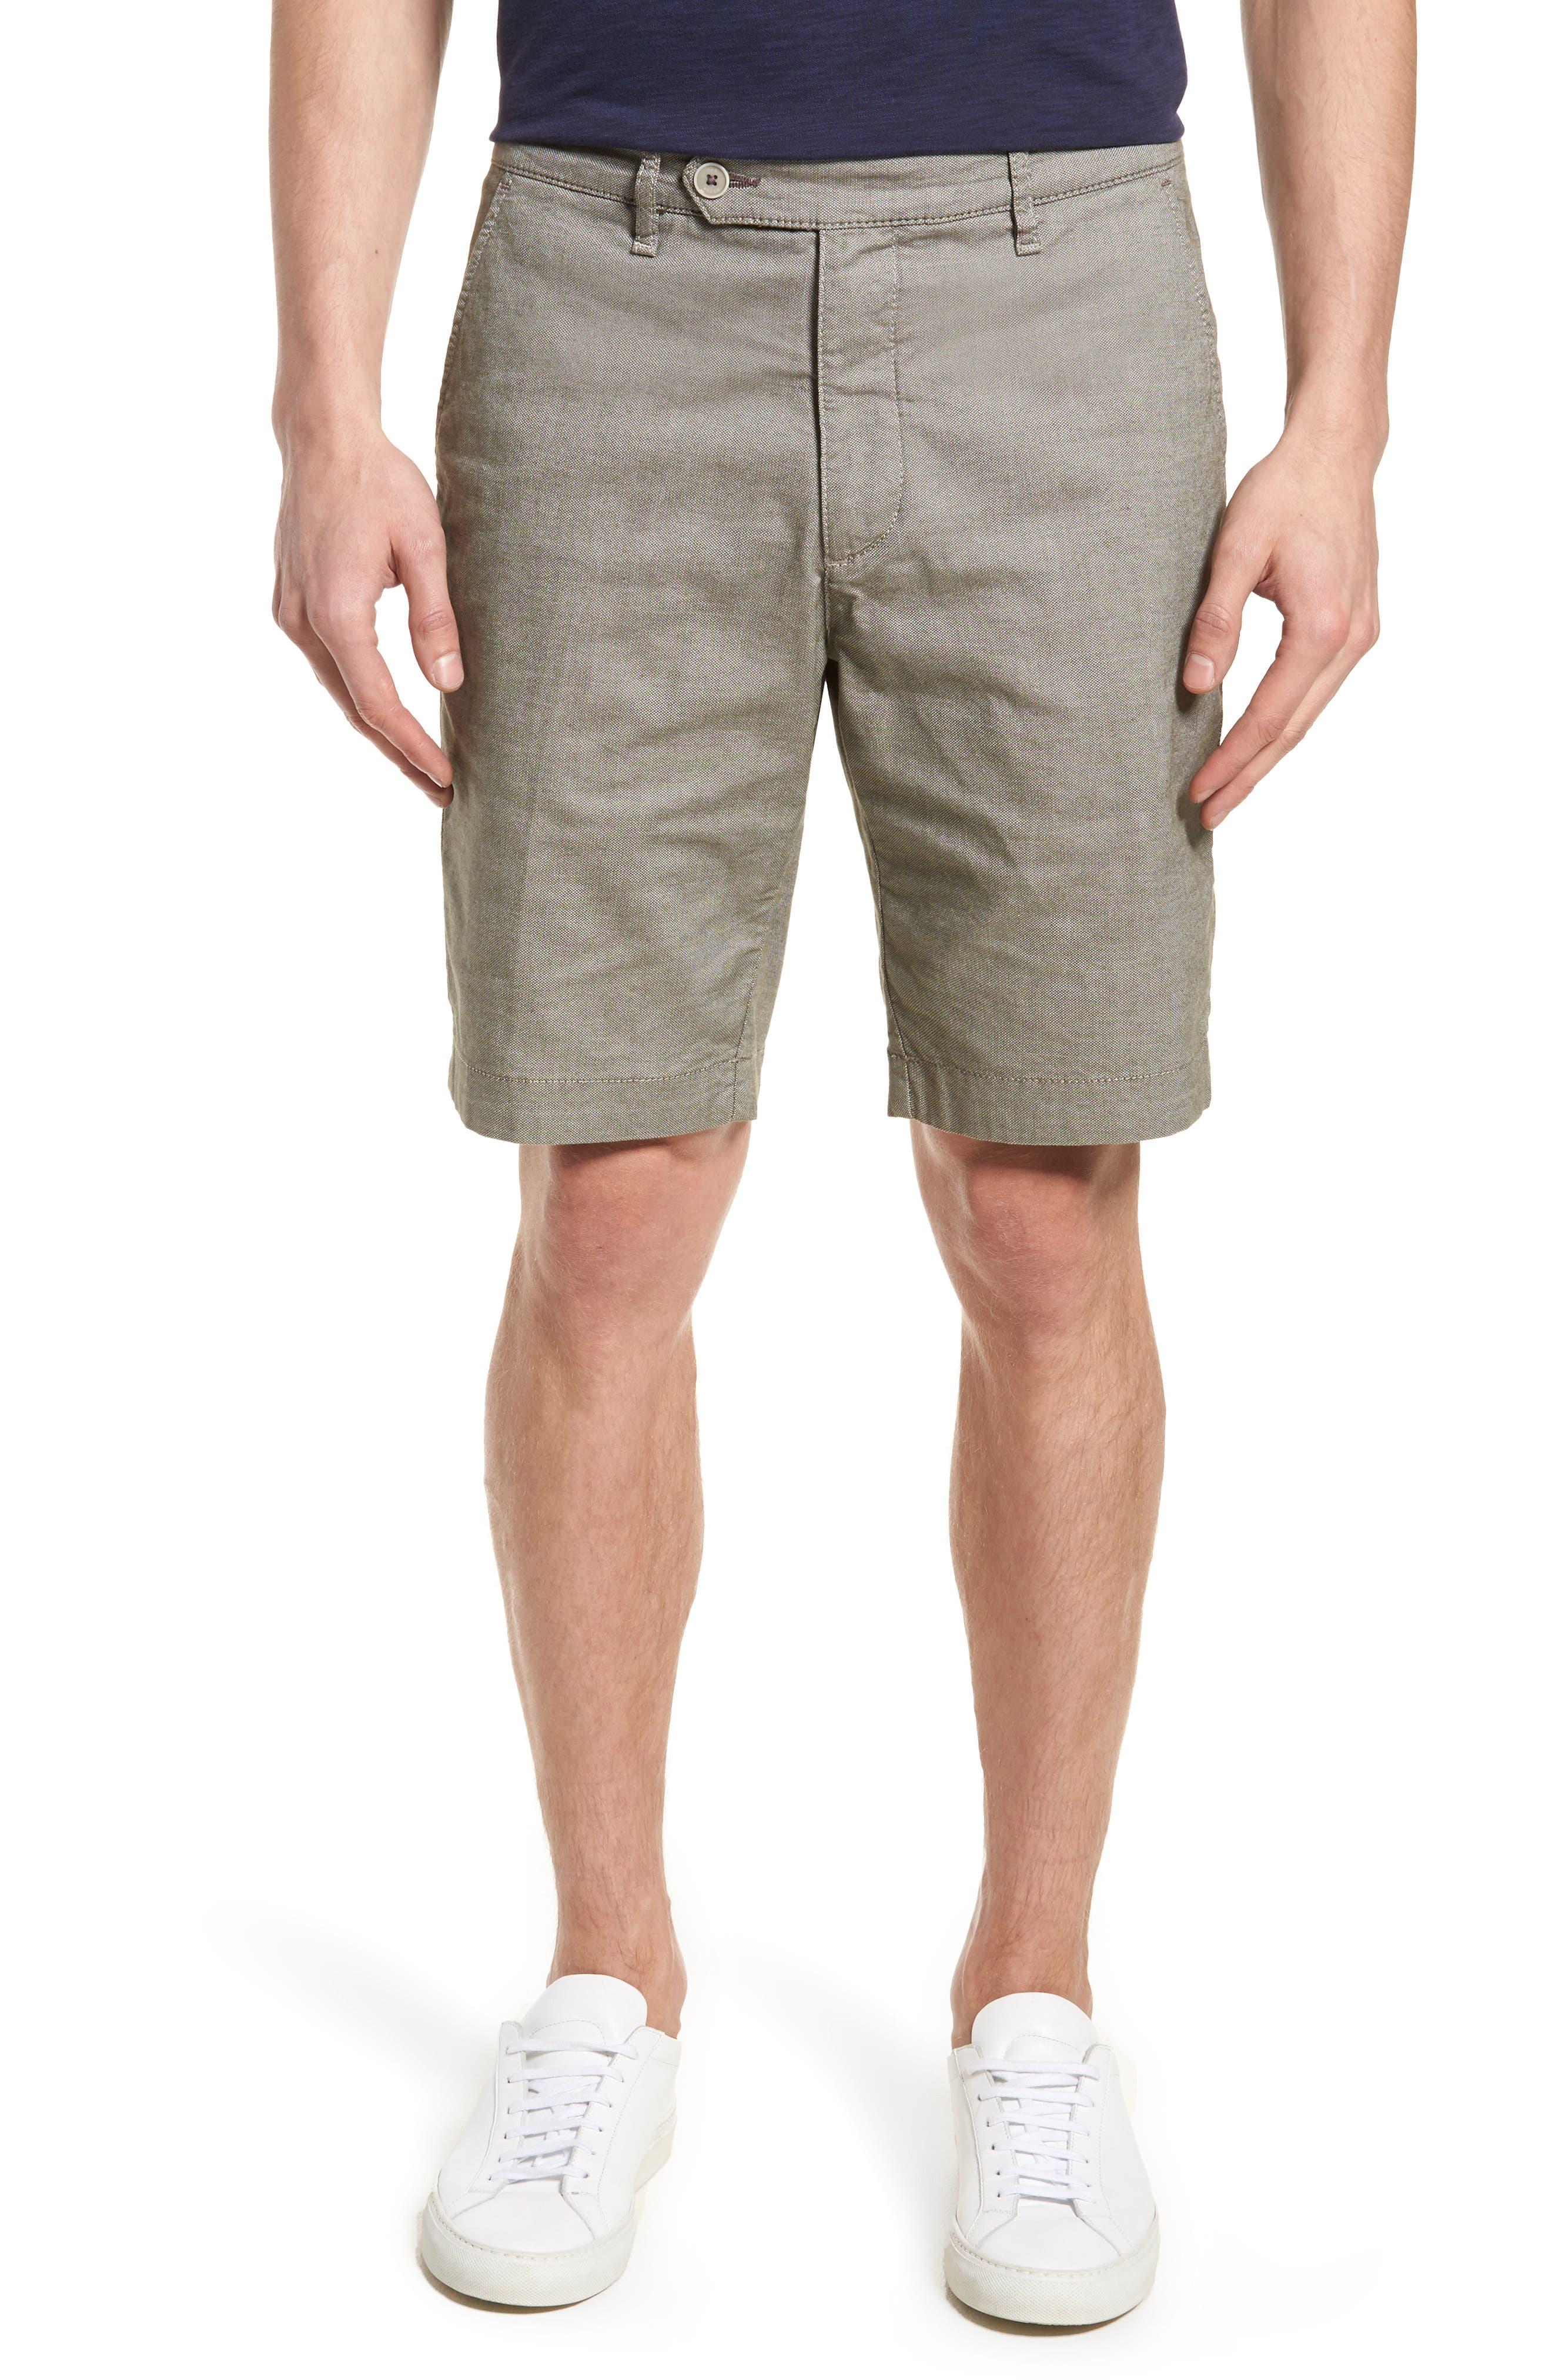 Herbosh Shorts,                         Main,                         color, GREY MARL